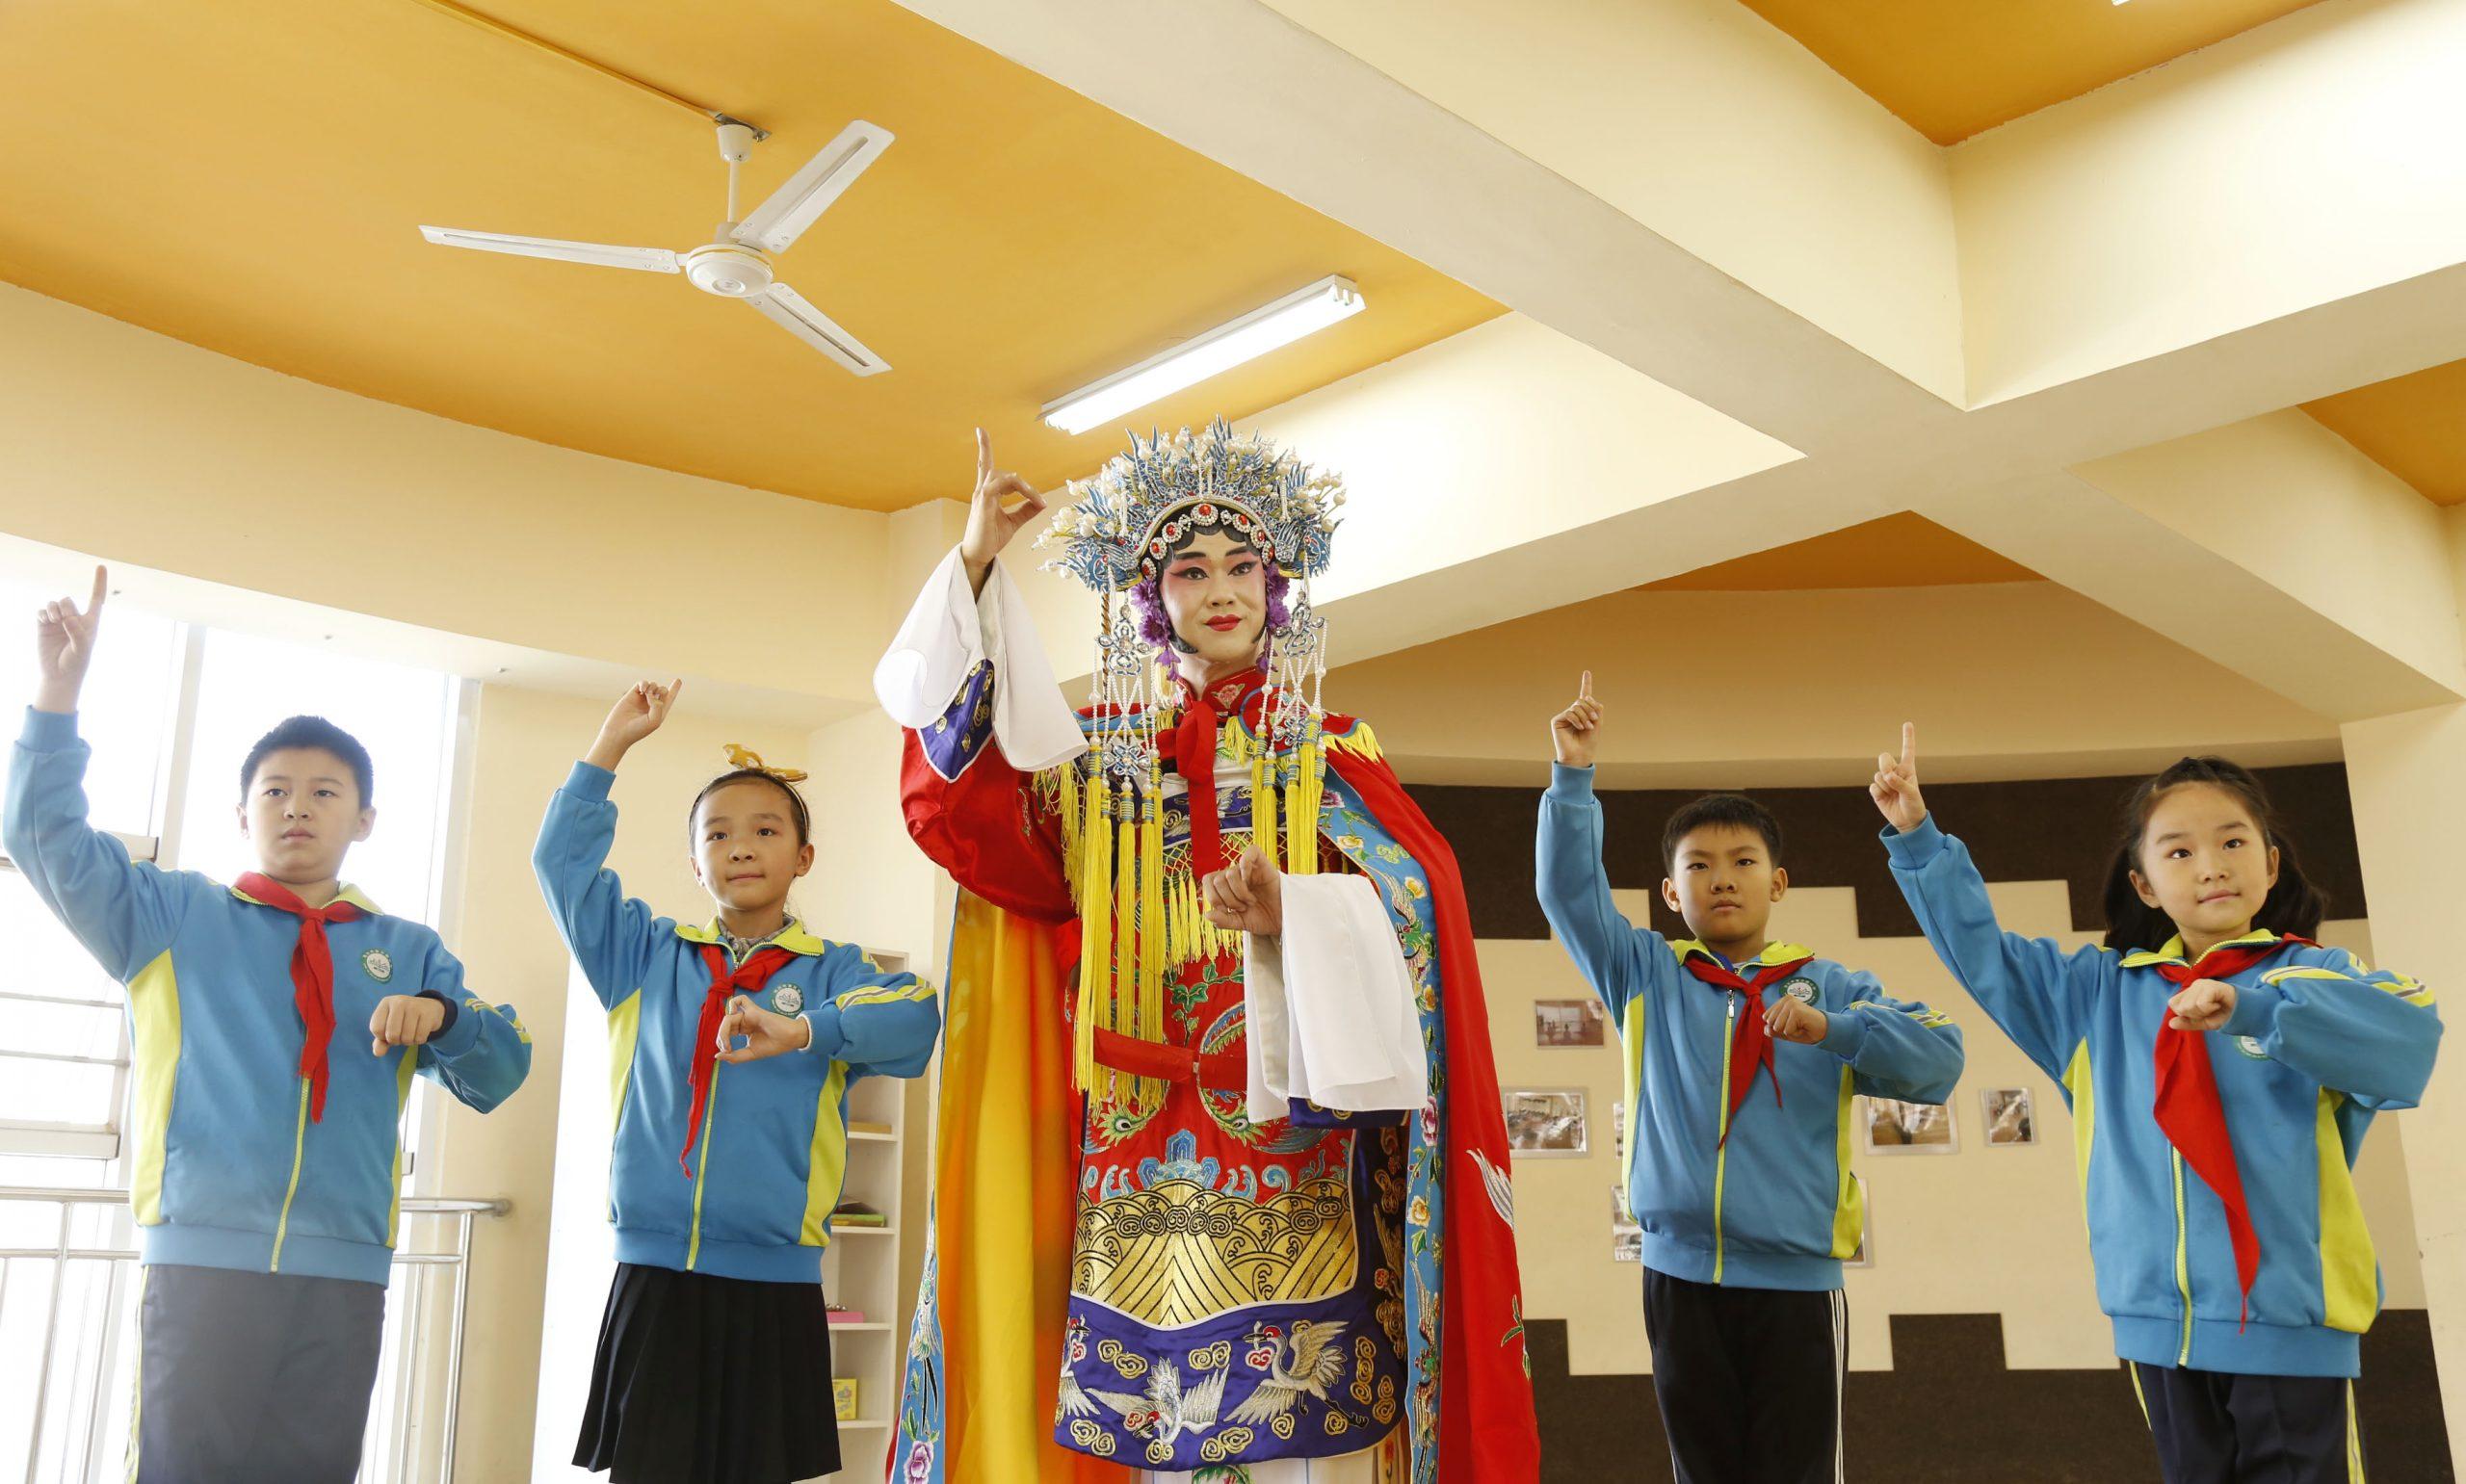 Máximo asesor político pide a escuelas promover cultura tradicional china